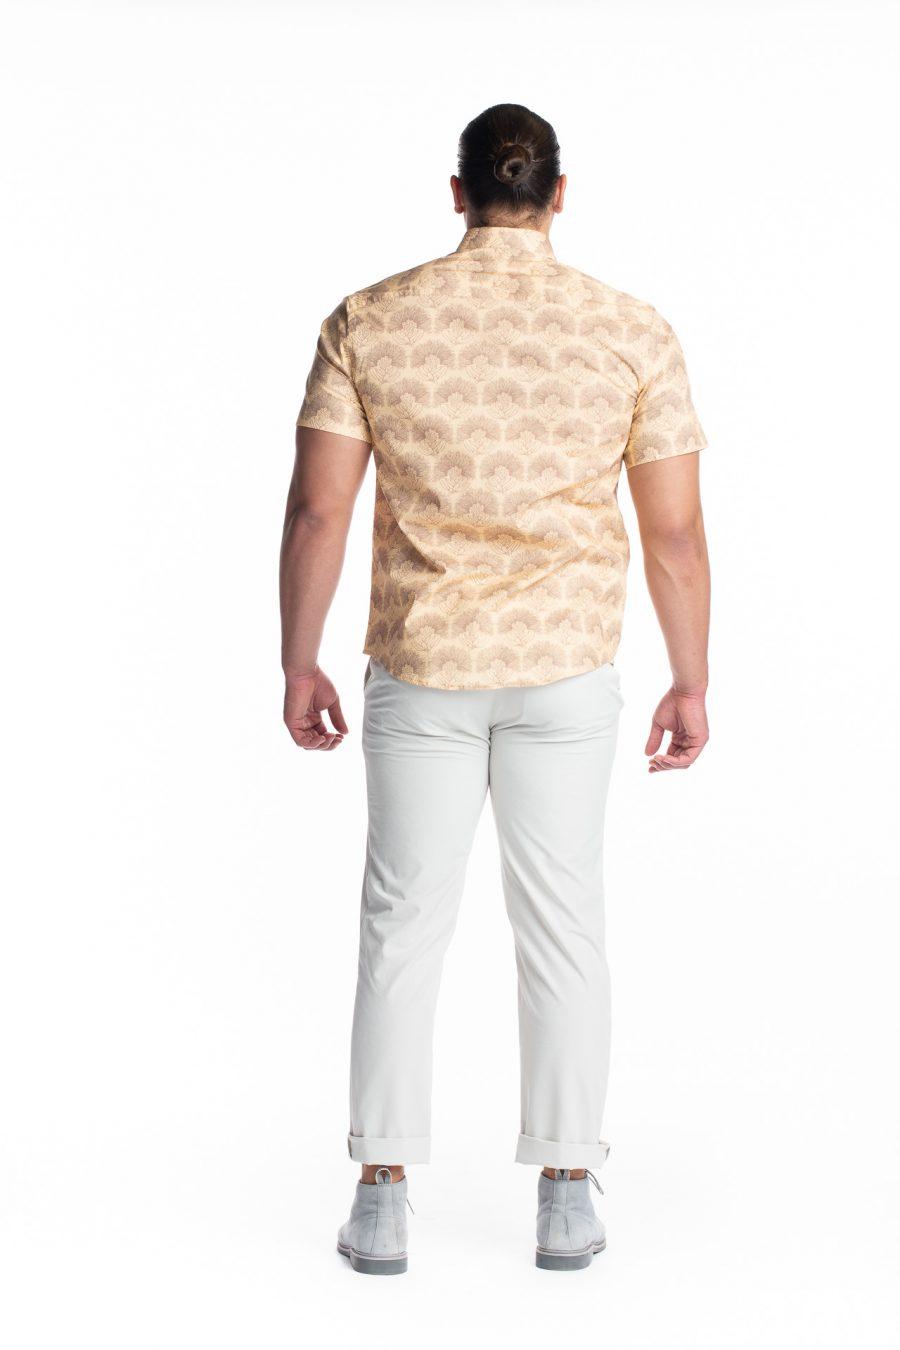 Male model wearing Aloha Short Sleeve in Apricot Sherbert/Gingersnap Kalihilehua - Back View